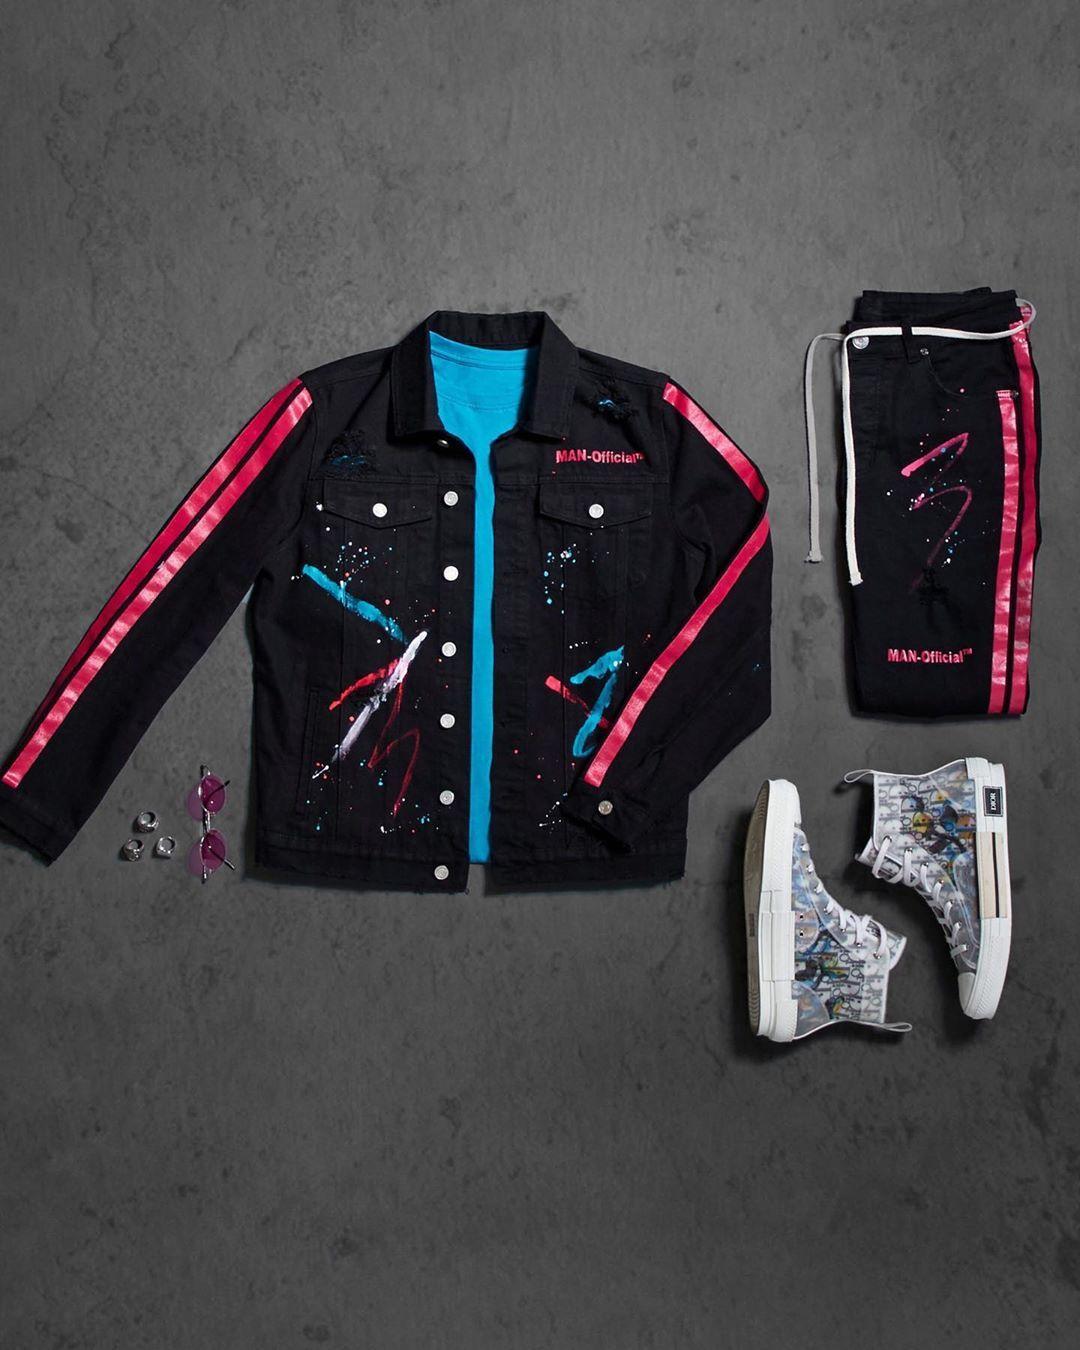 Yeezy fashion, Urban fashion